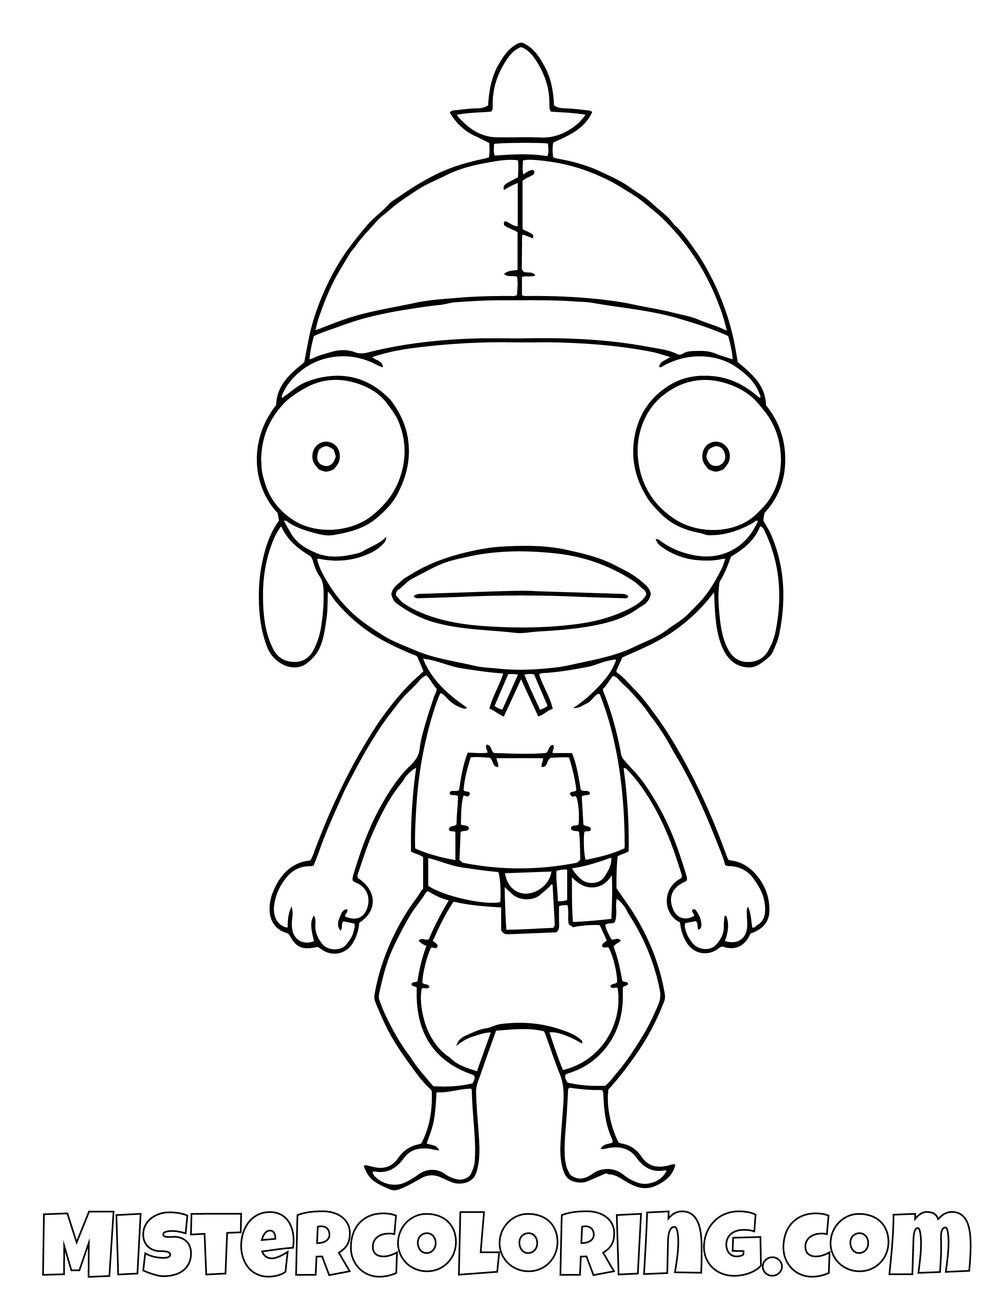 Free Fishstick Chibi Skin Fortnite Coloring Page For Kids